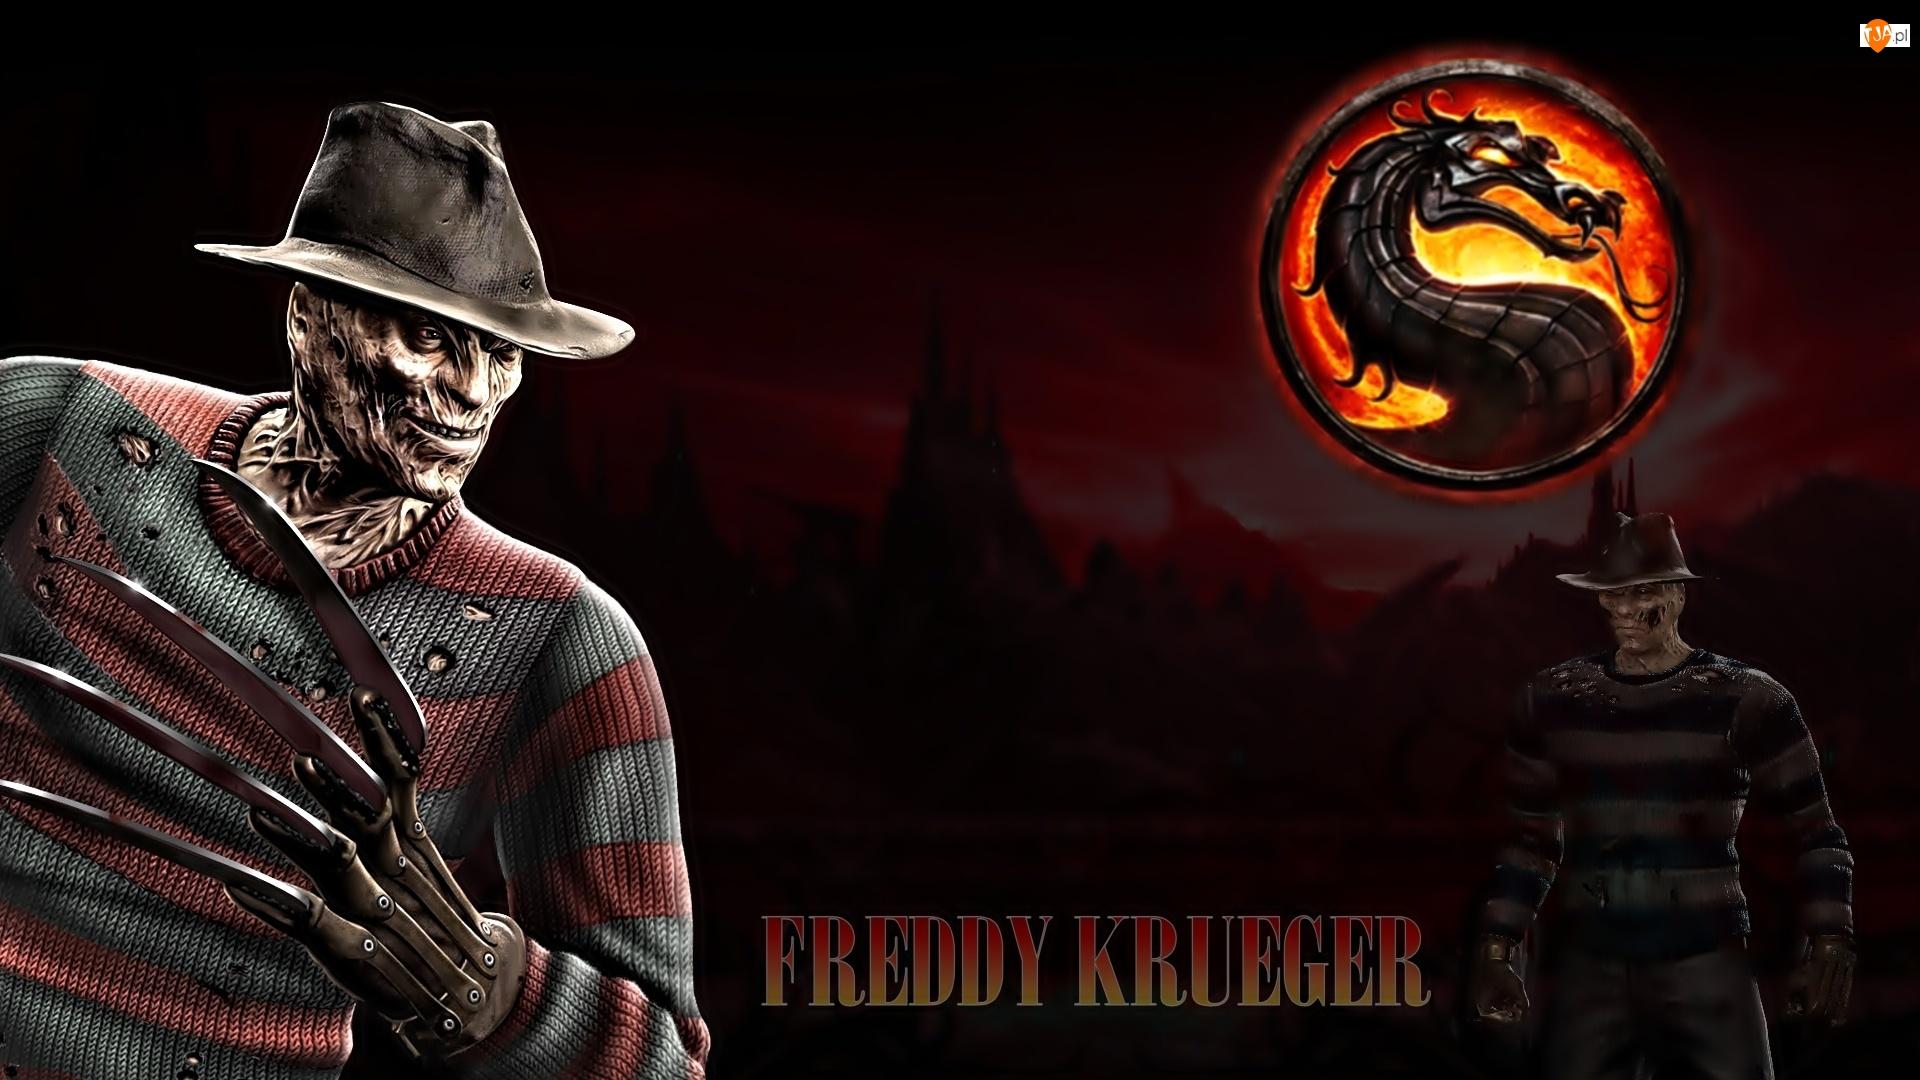 Mortal Kombat, Freddy Krueger